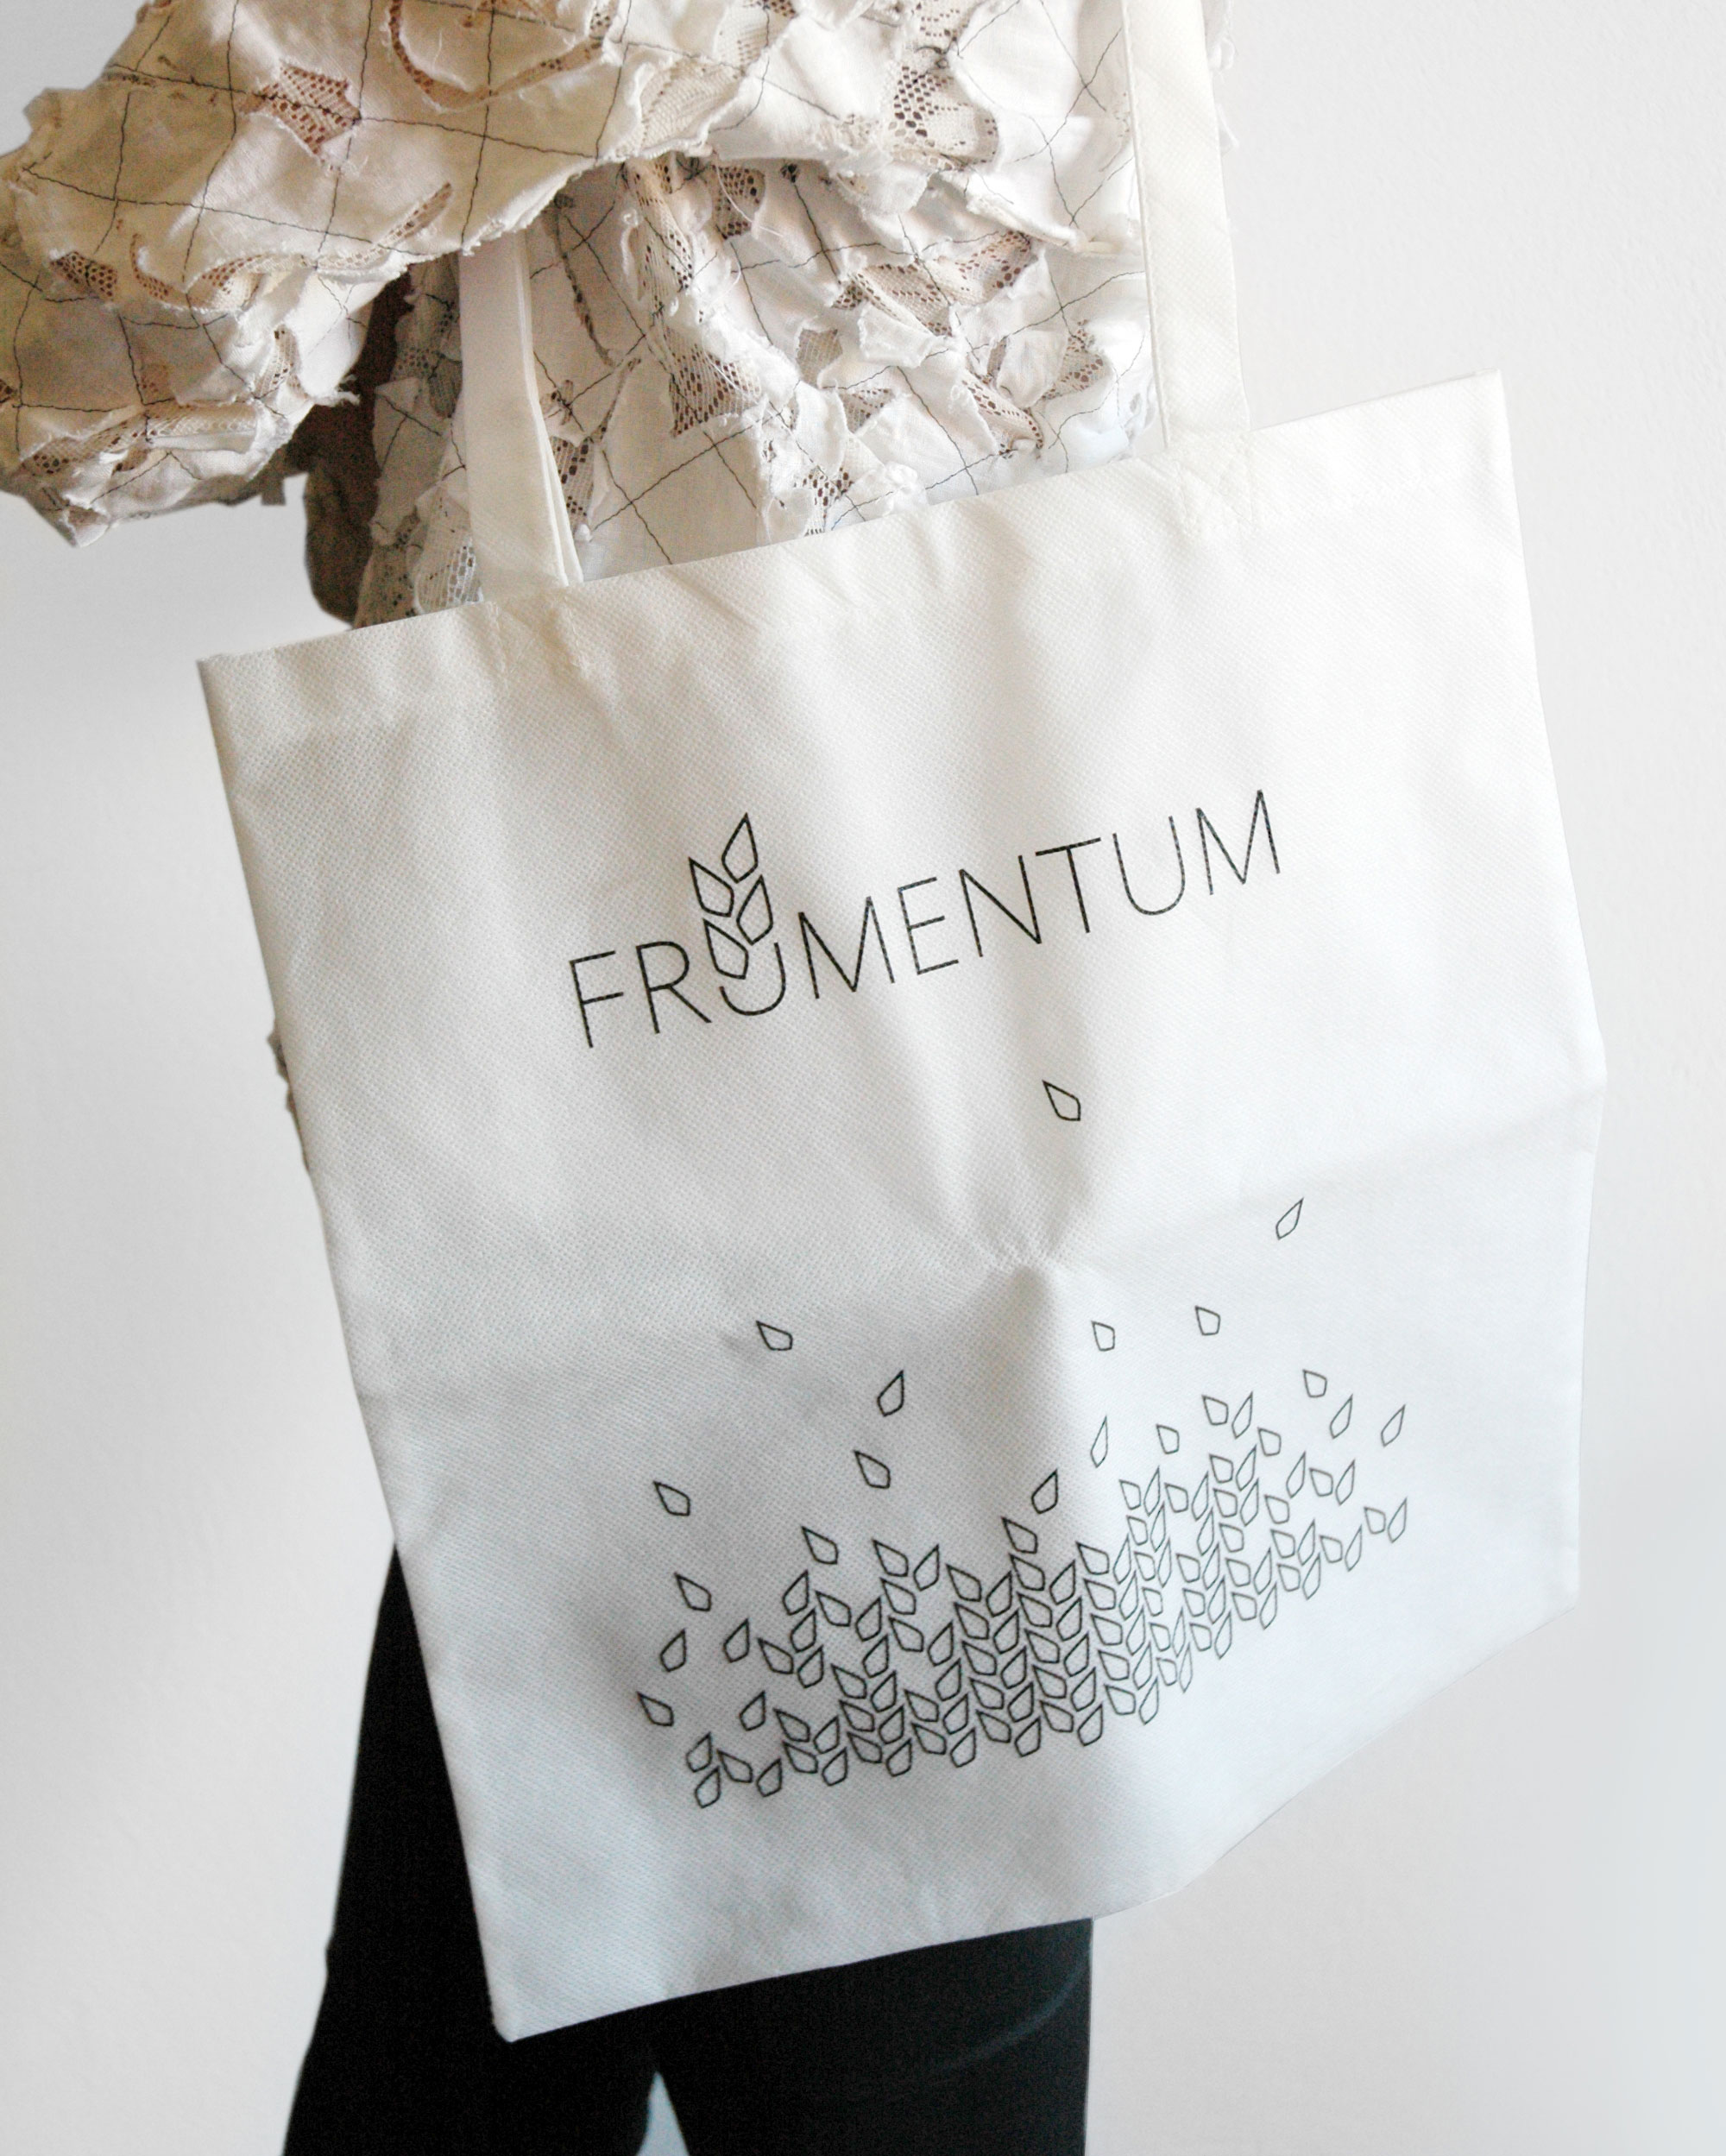 masavukmanovic.com - frumentum bakeries - branding 03